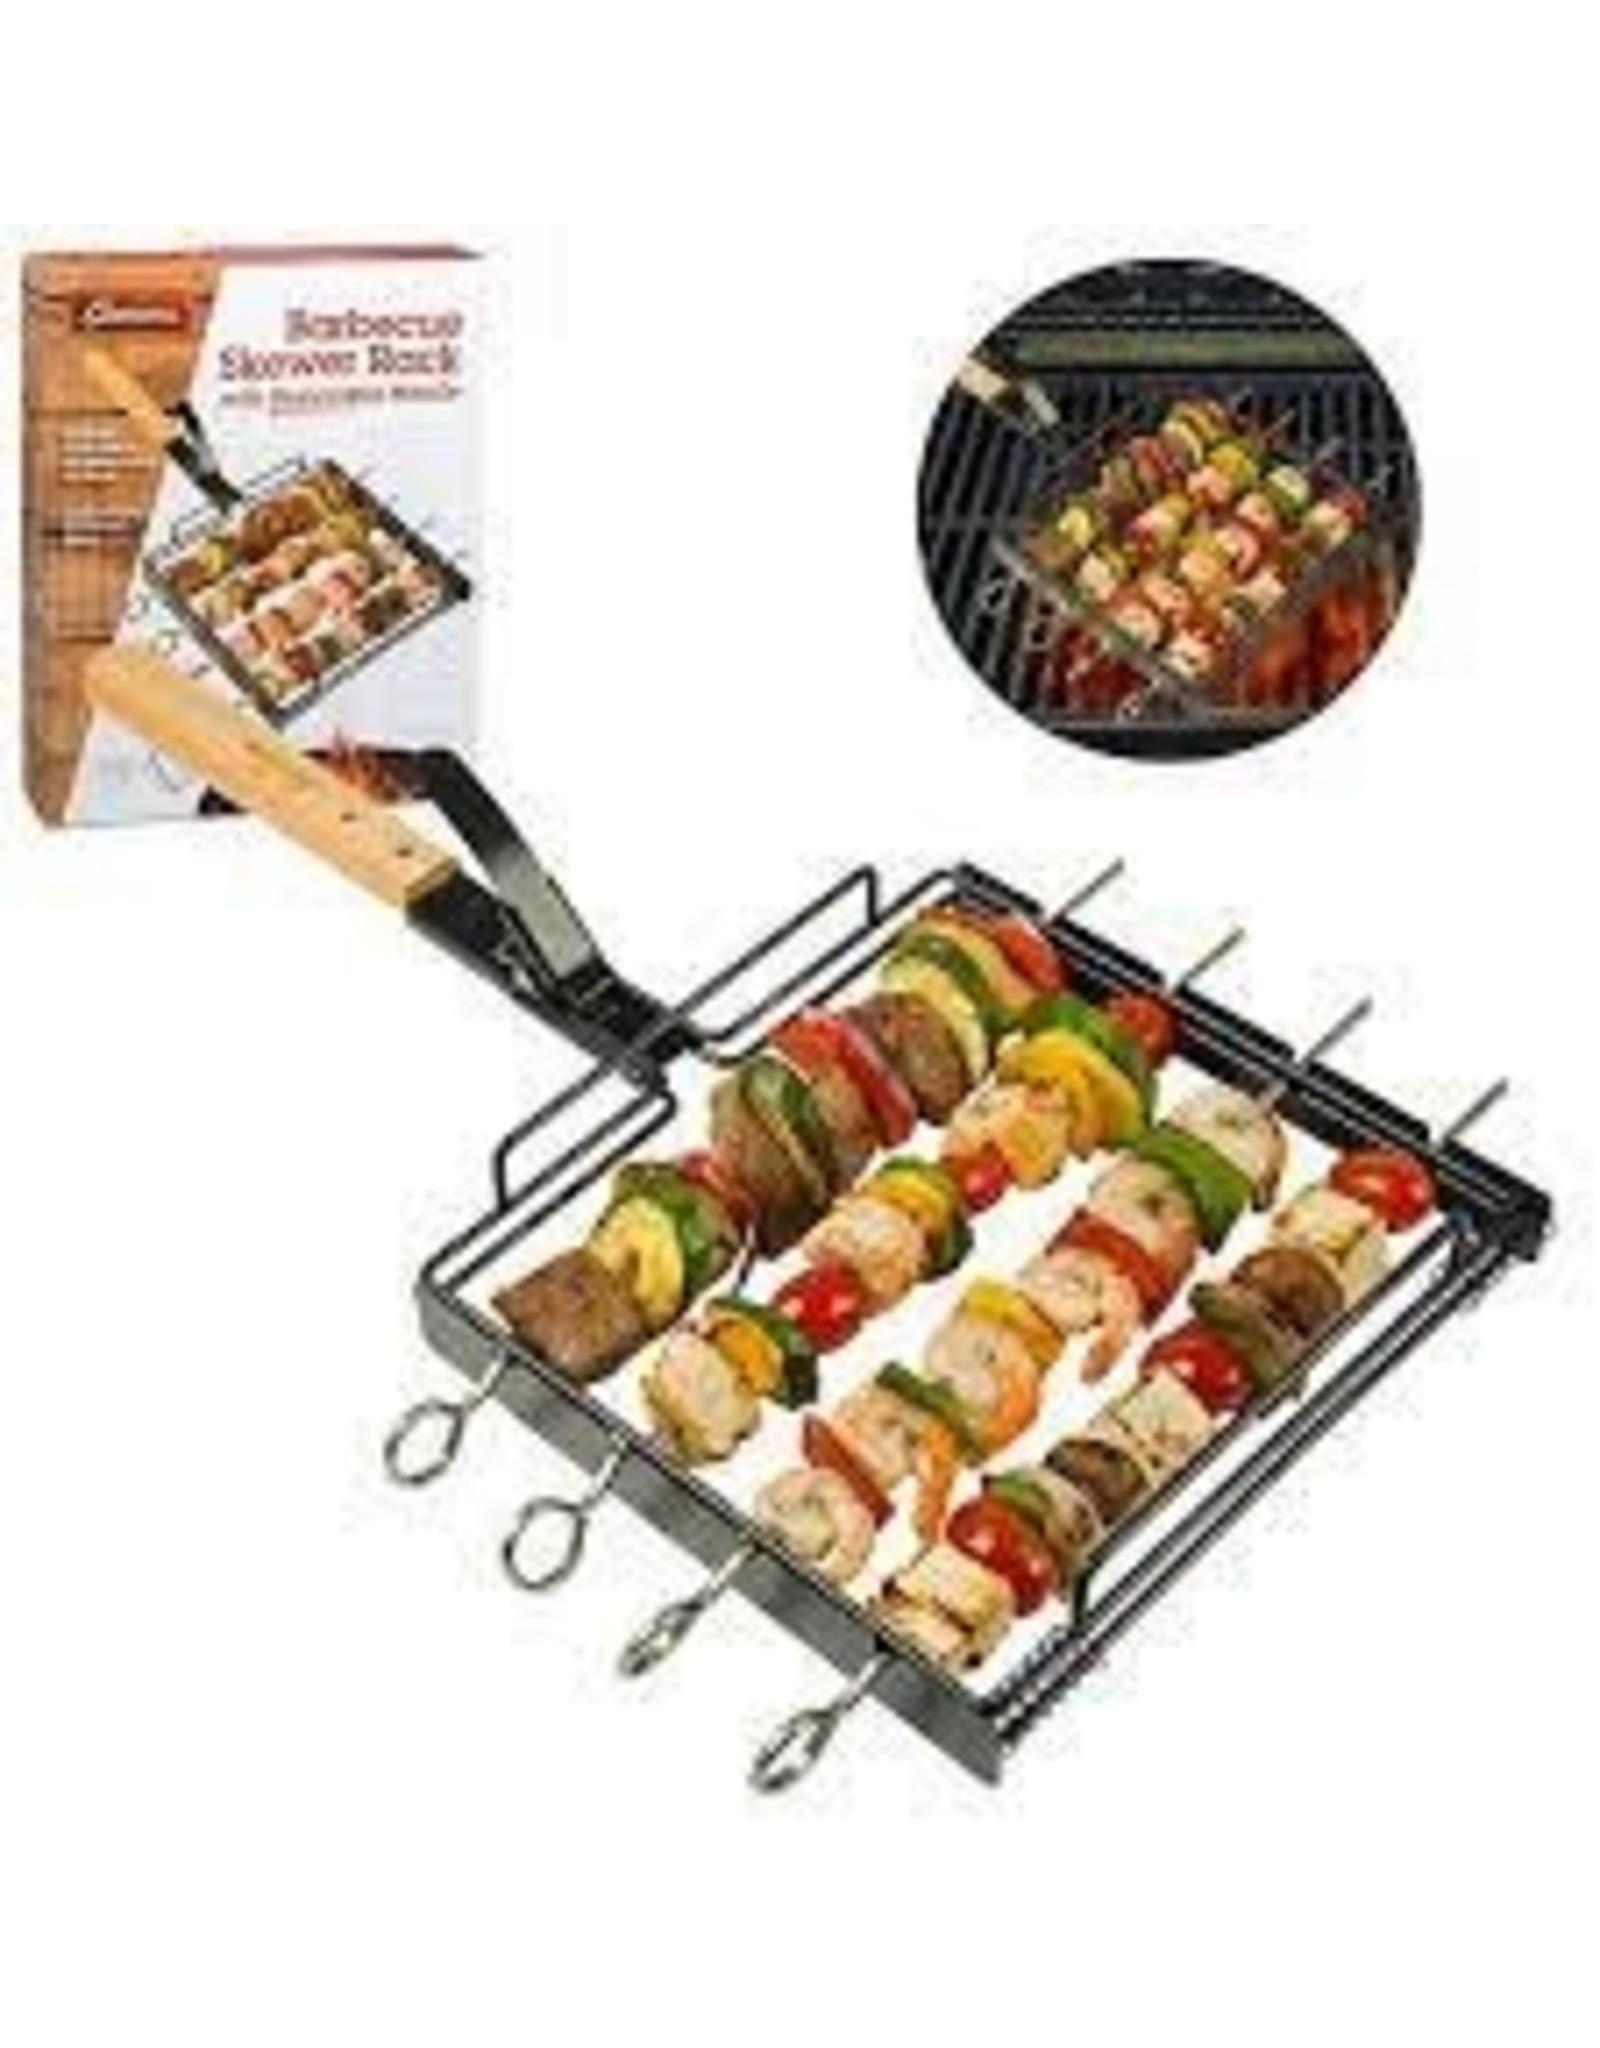 Cameron CAMERON- Barbecue Skewer Rack